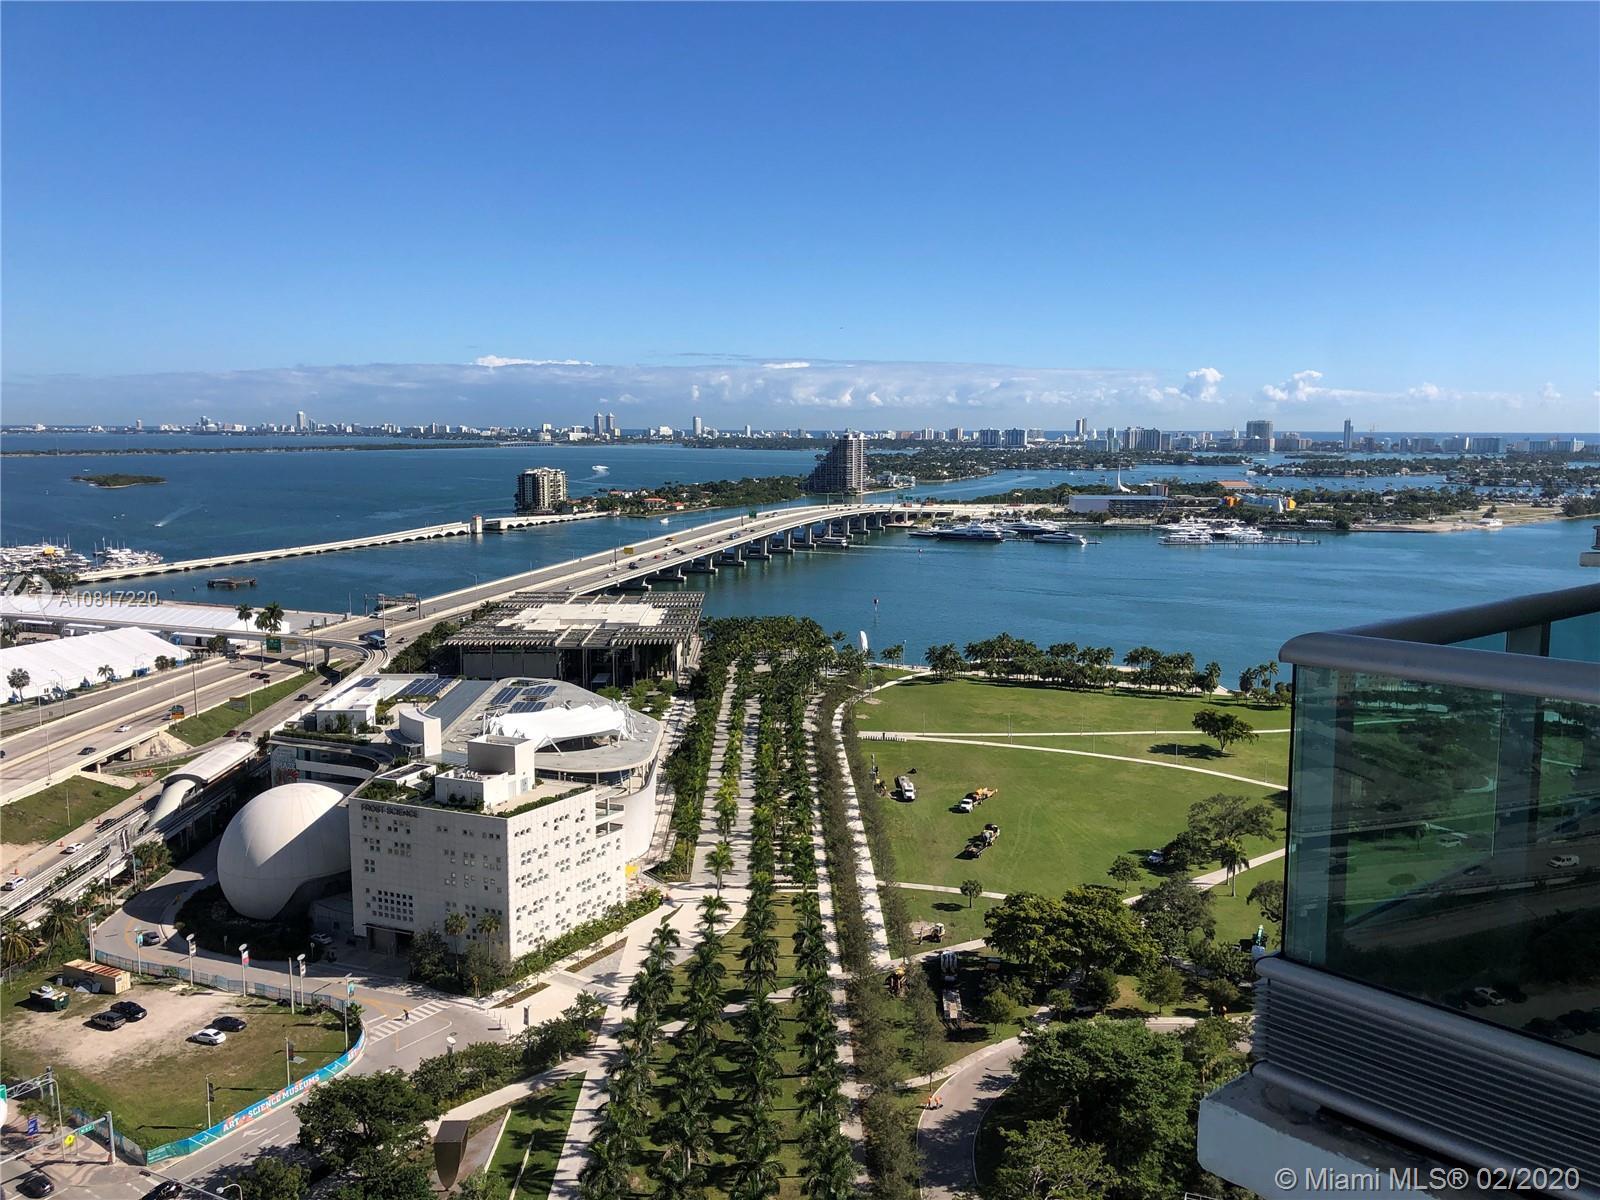 900 Biscayne Blvd, 3110 - Miami, Florida